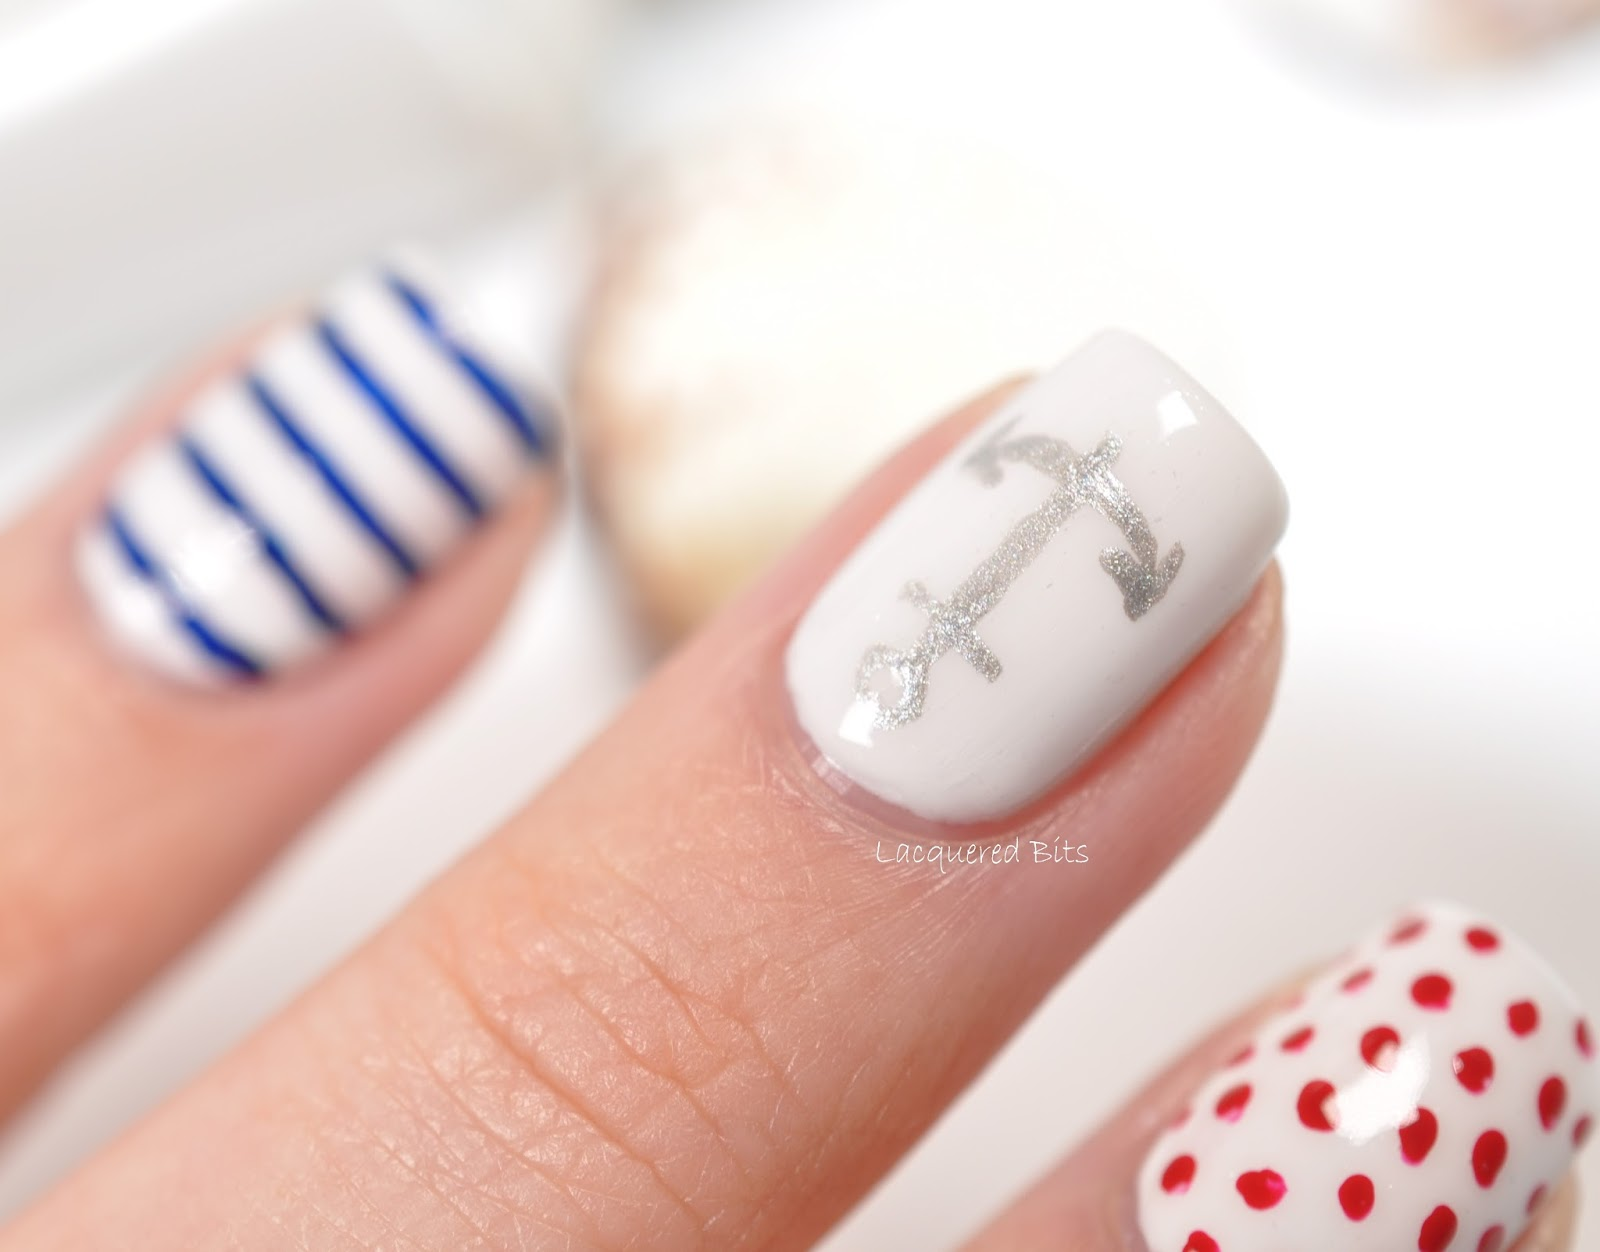 Essie Navy Summer - Lacquered Bits